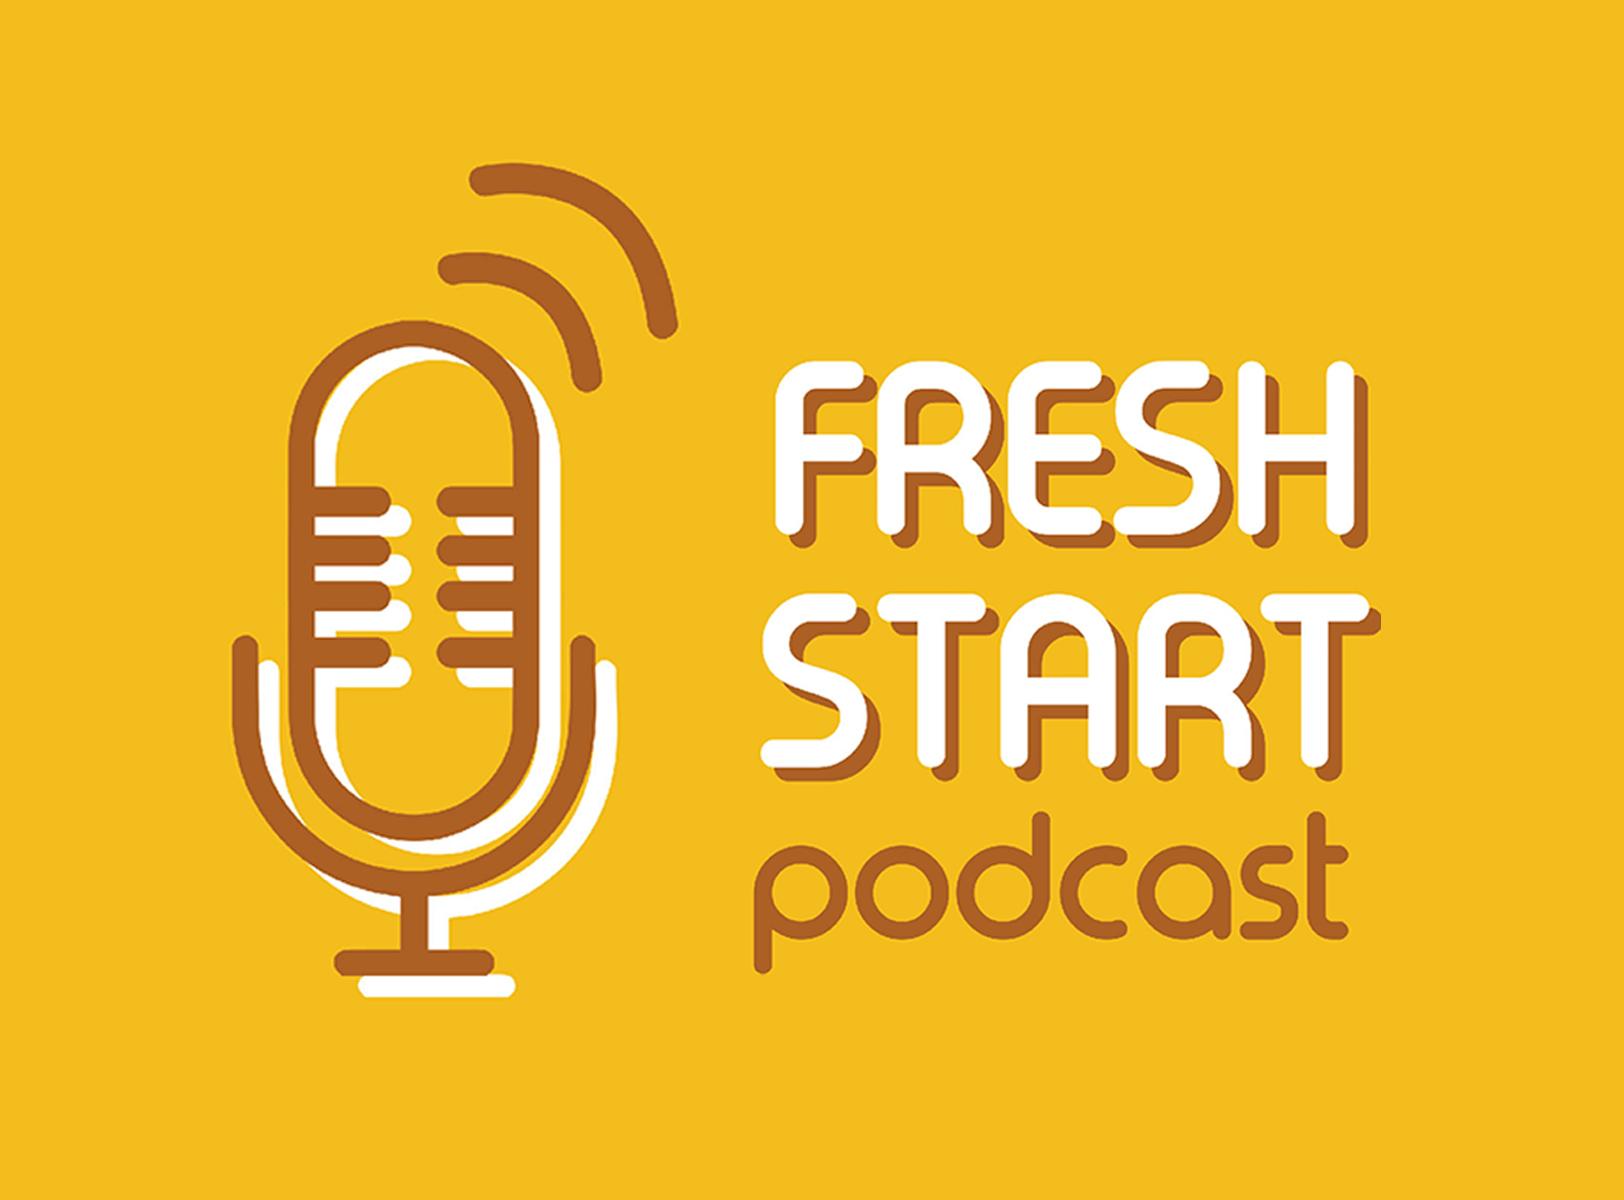 Fresh Start: Podcast News (12/4/2019 Wed.)